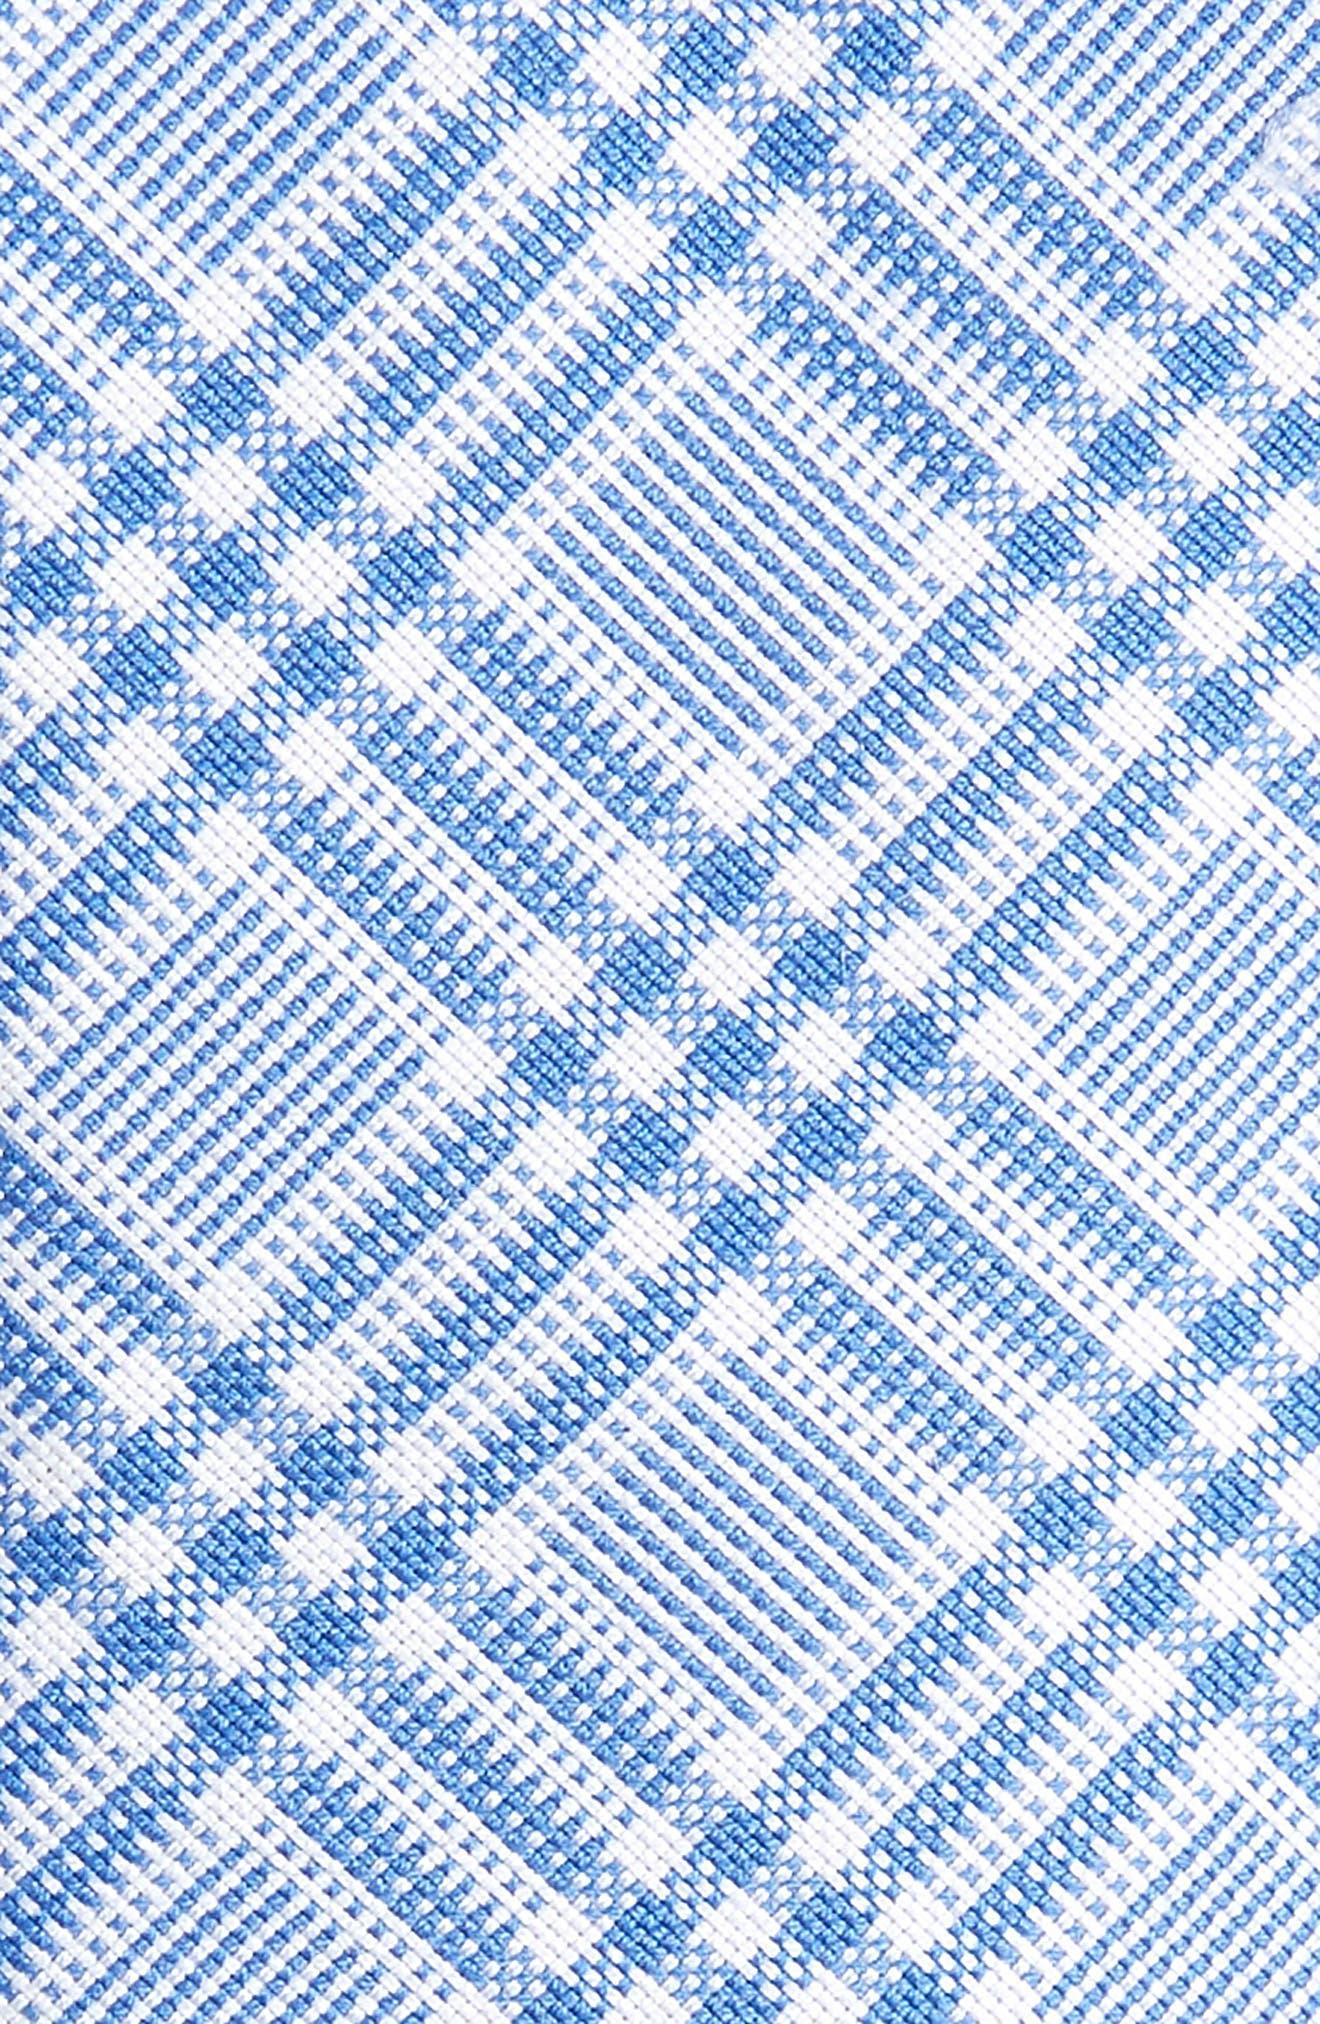 Brook Plaid Cotton Skinny Tie,                             Alternate thumbnail 2, color,                             400